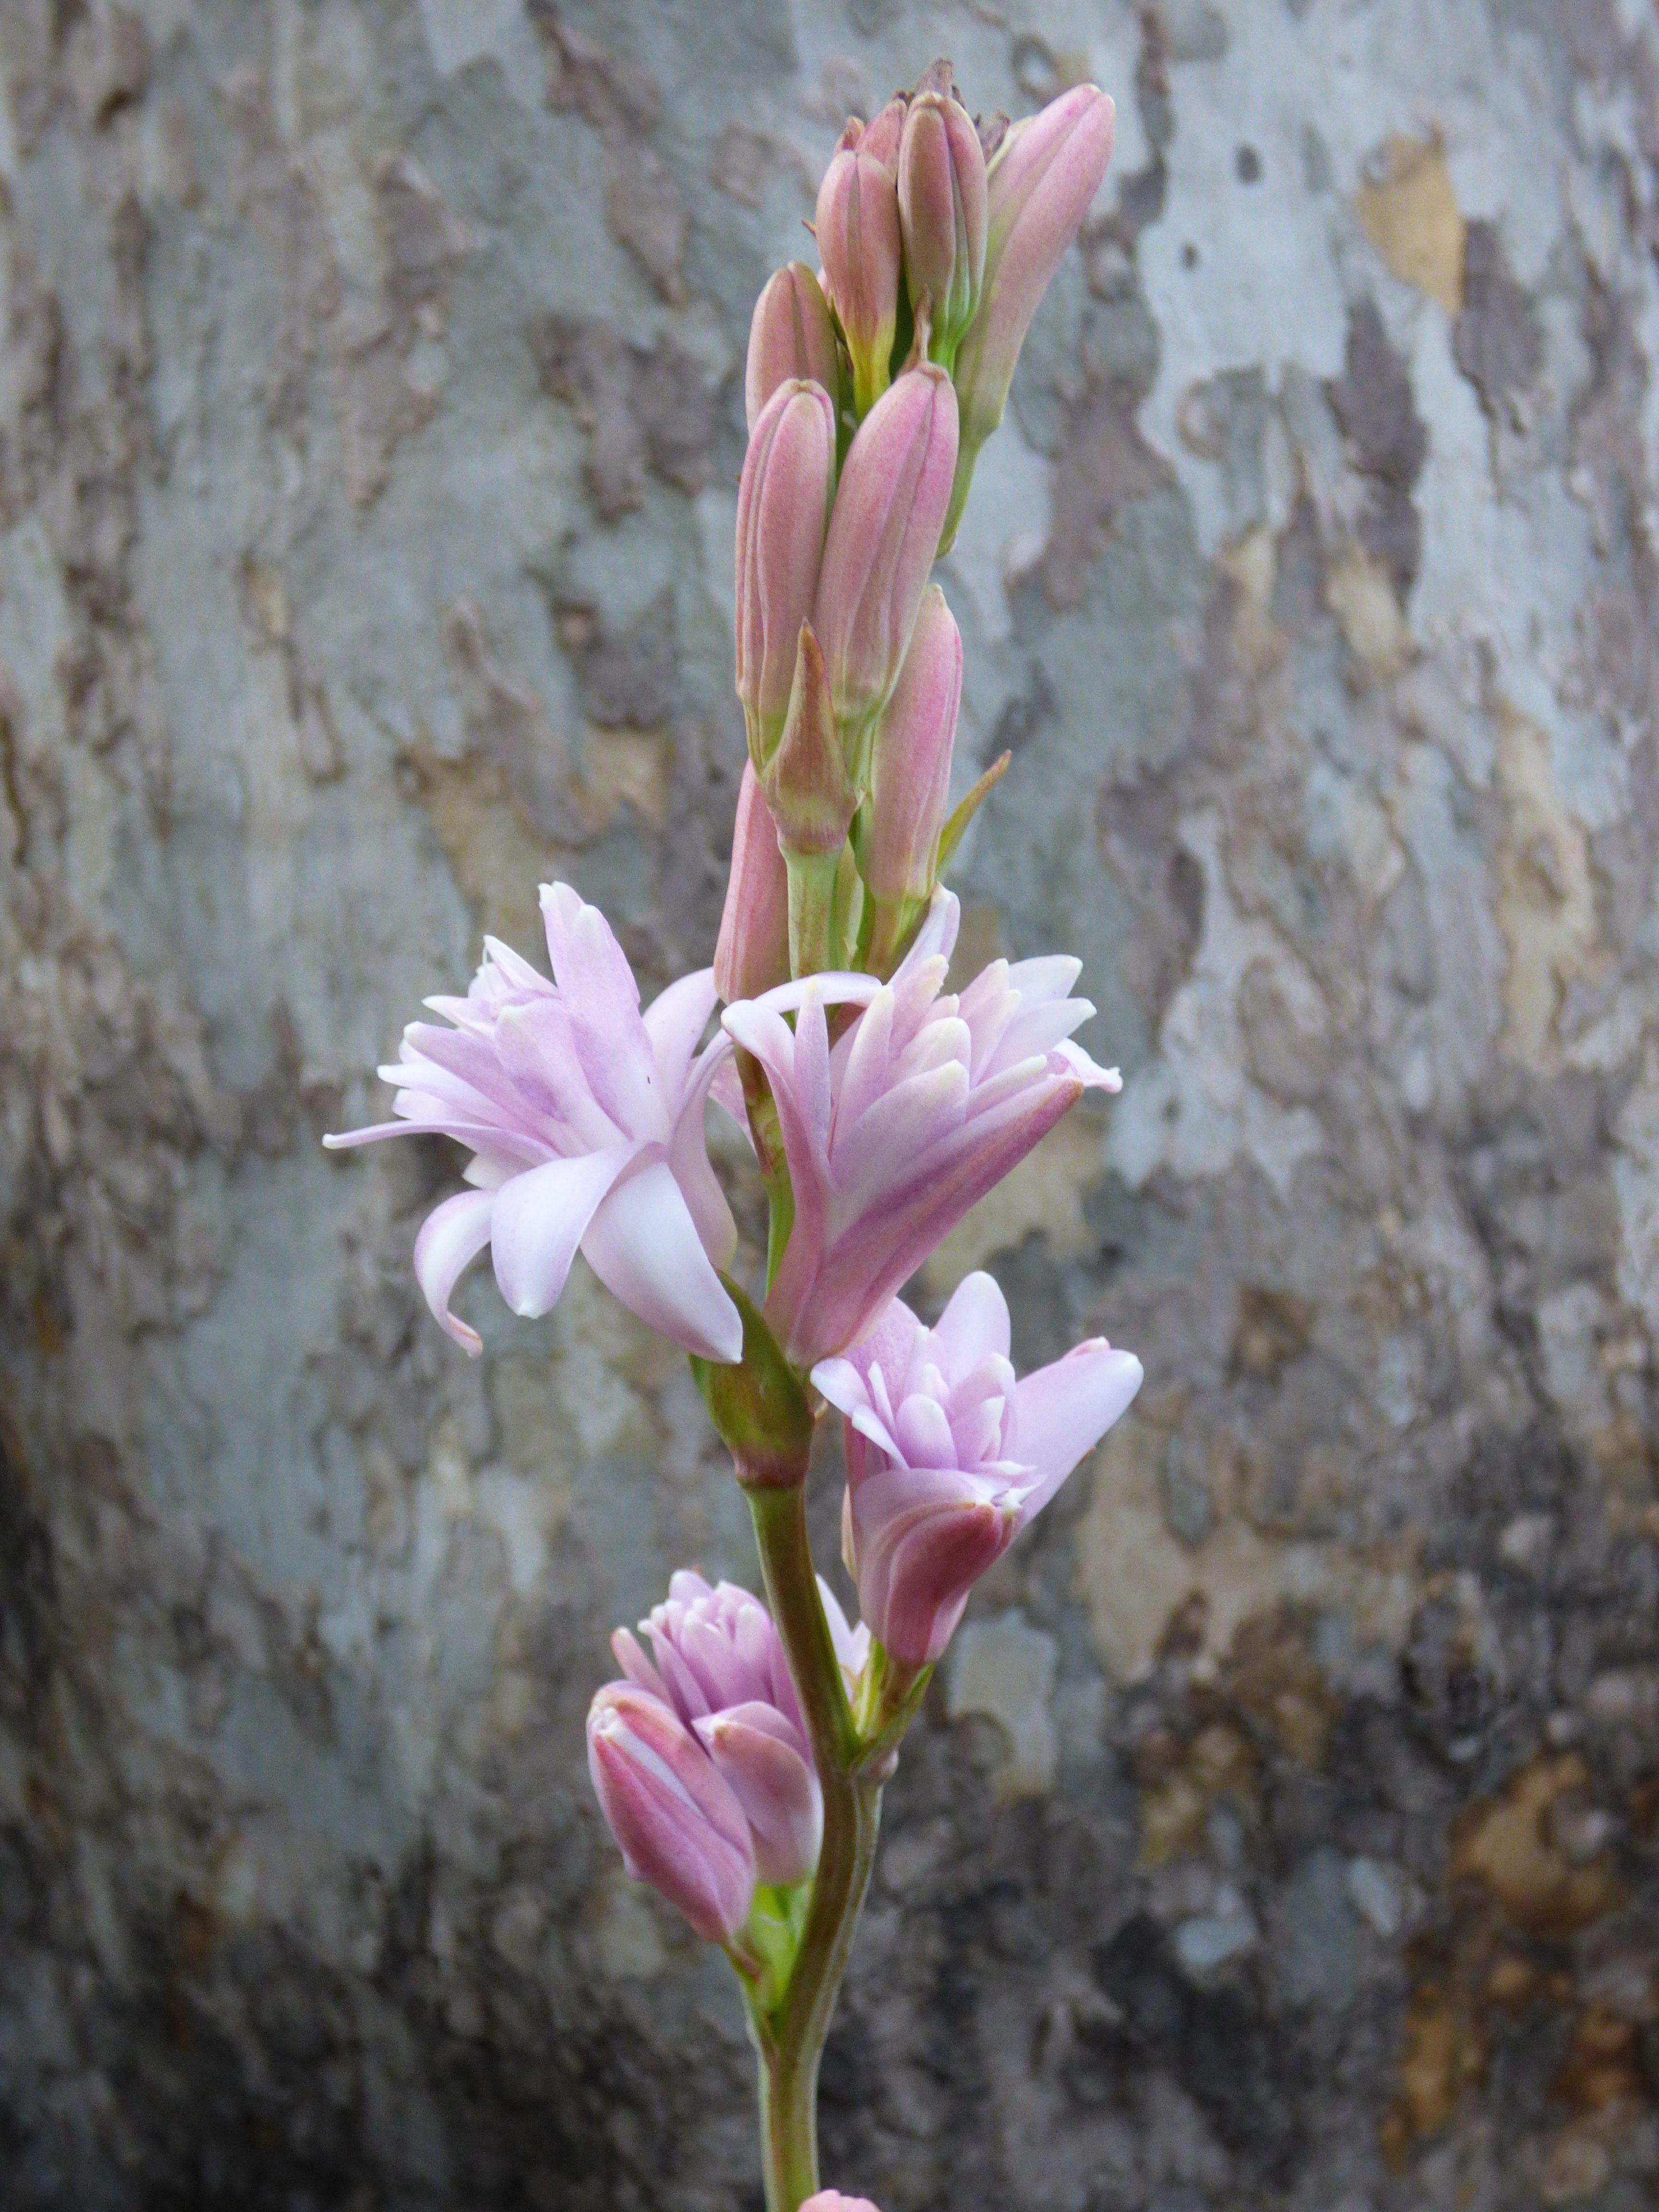 Coltivare Fiori Da Recidere tuberose colorate | italian botanical trips